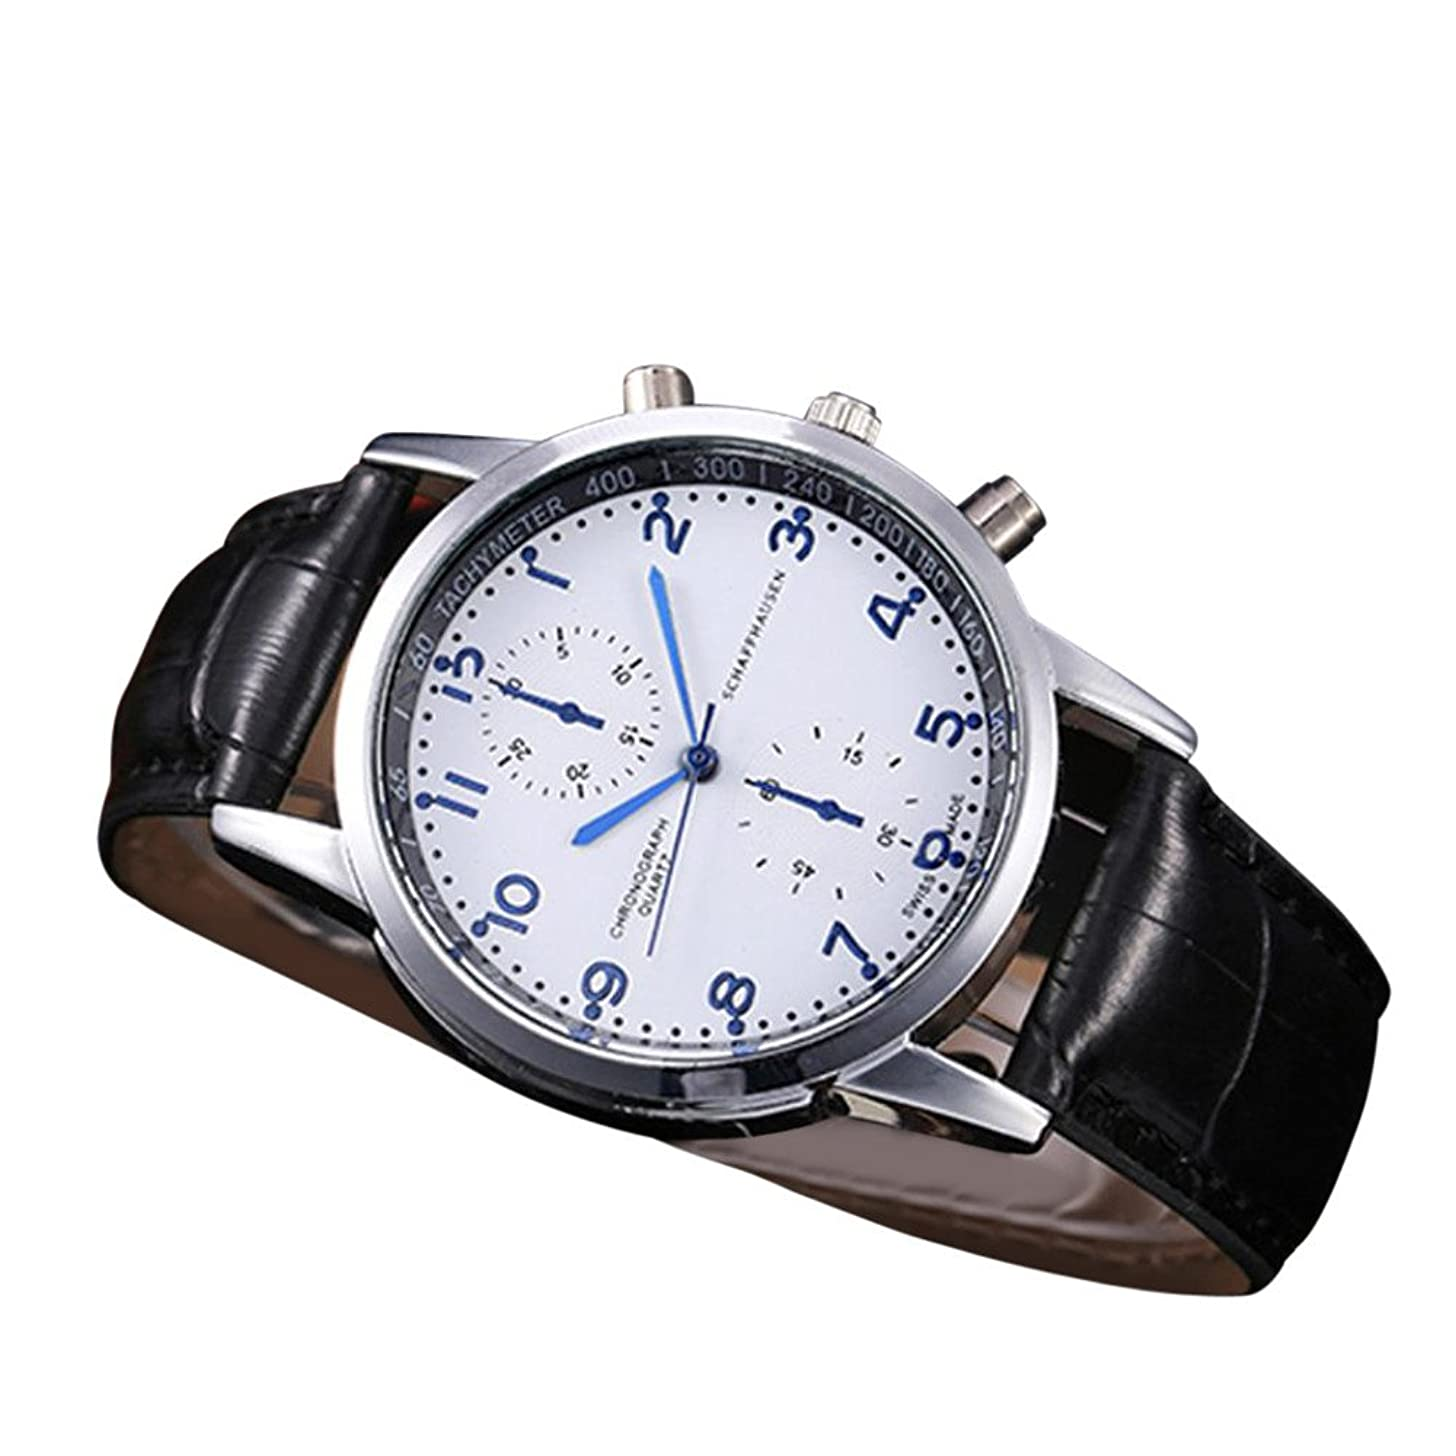 OWMEOT Watches,New Waterproof Unisex Casual Geneva Faux Leather Quartz Analog Wrist Watch Fashion